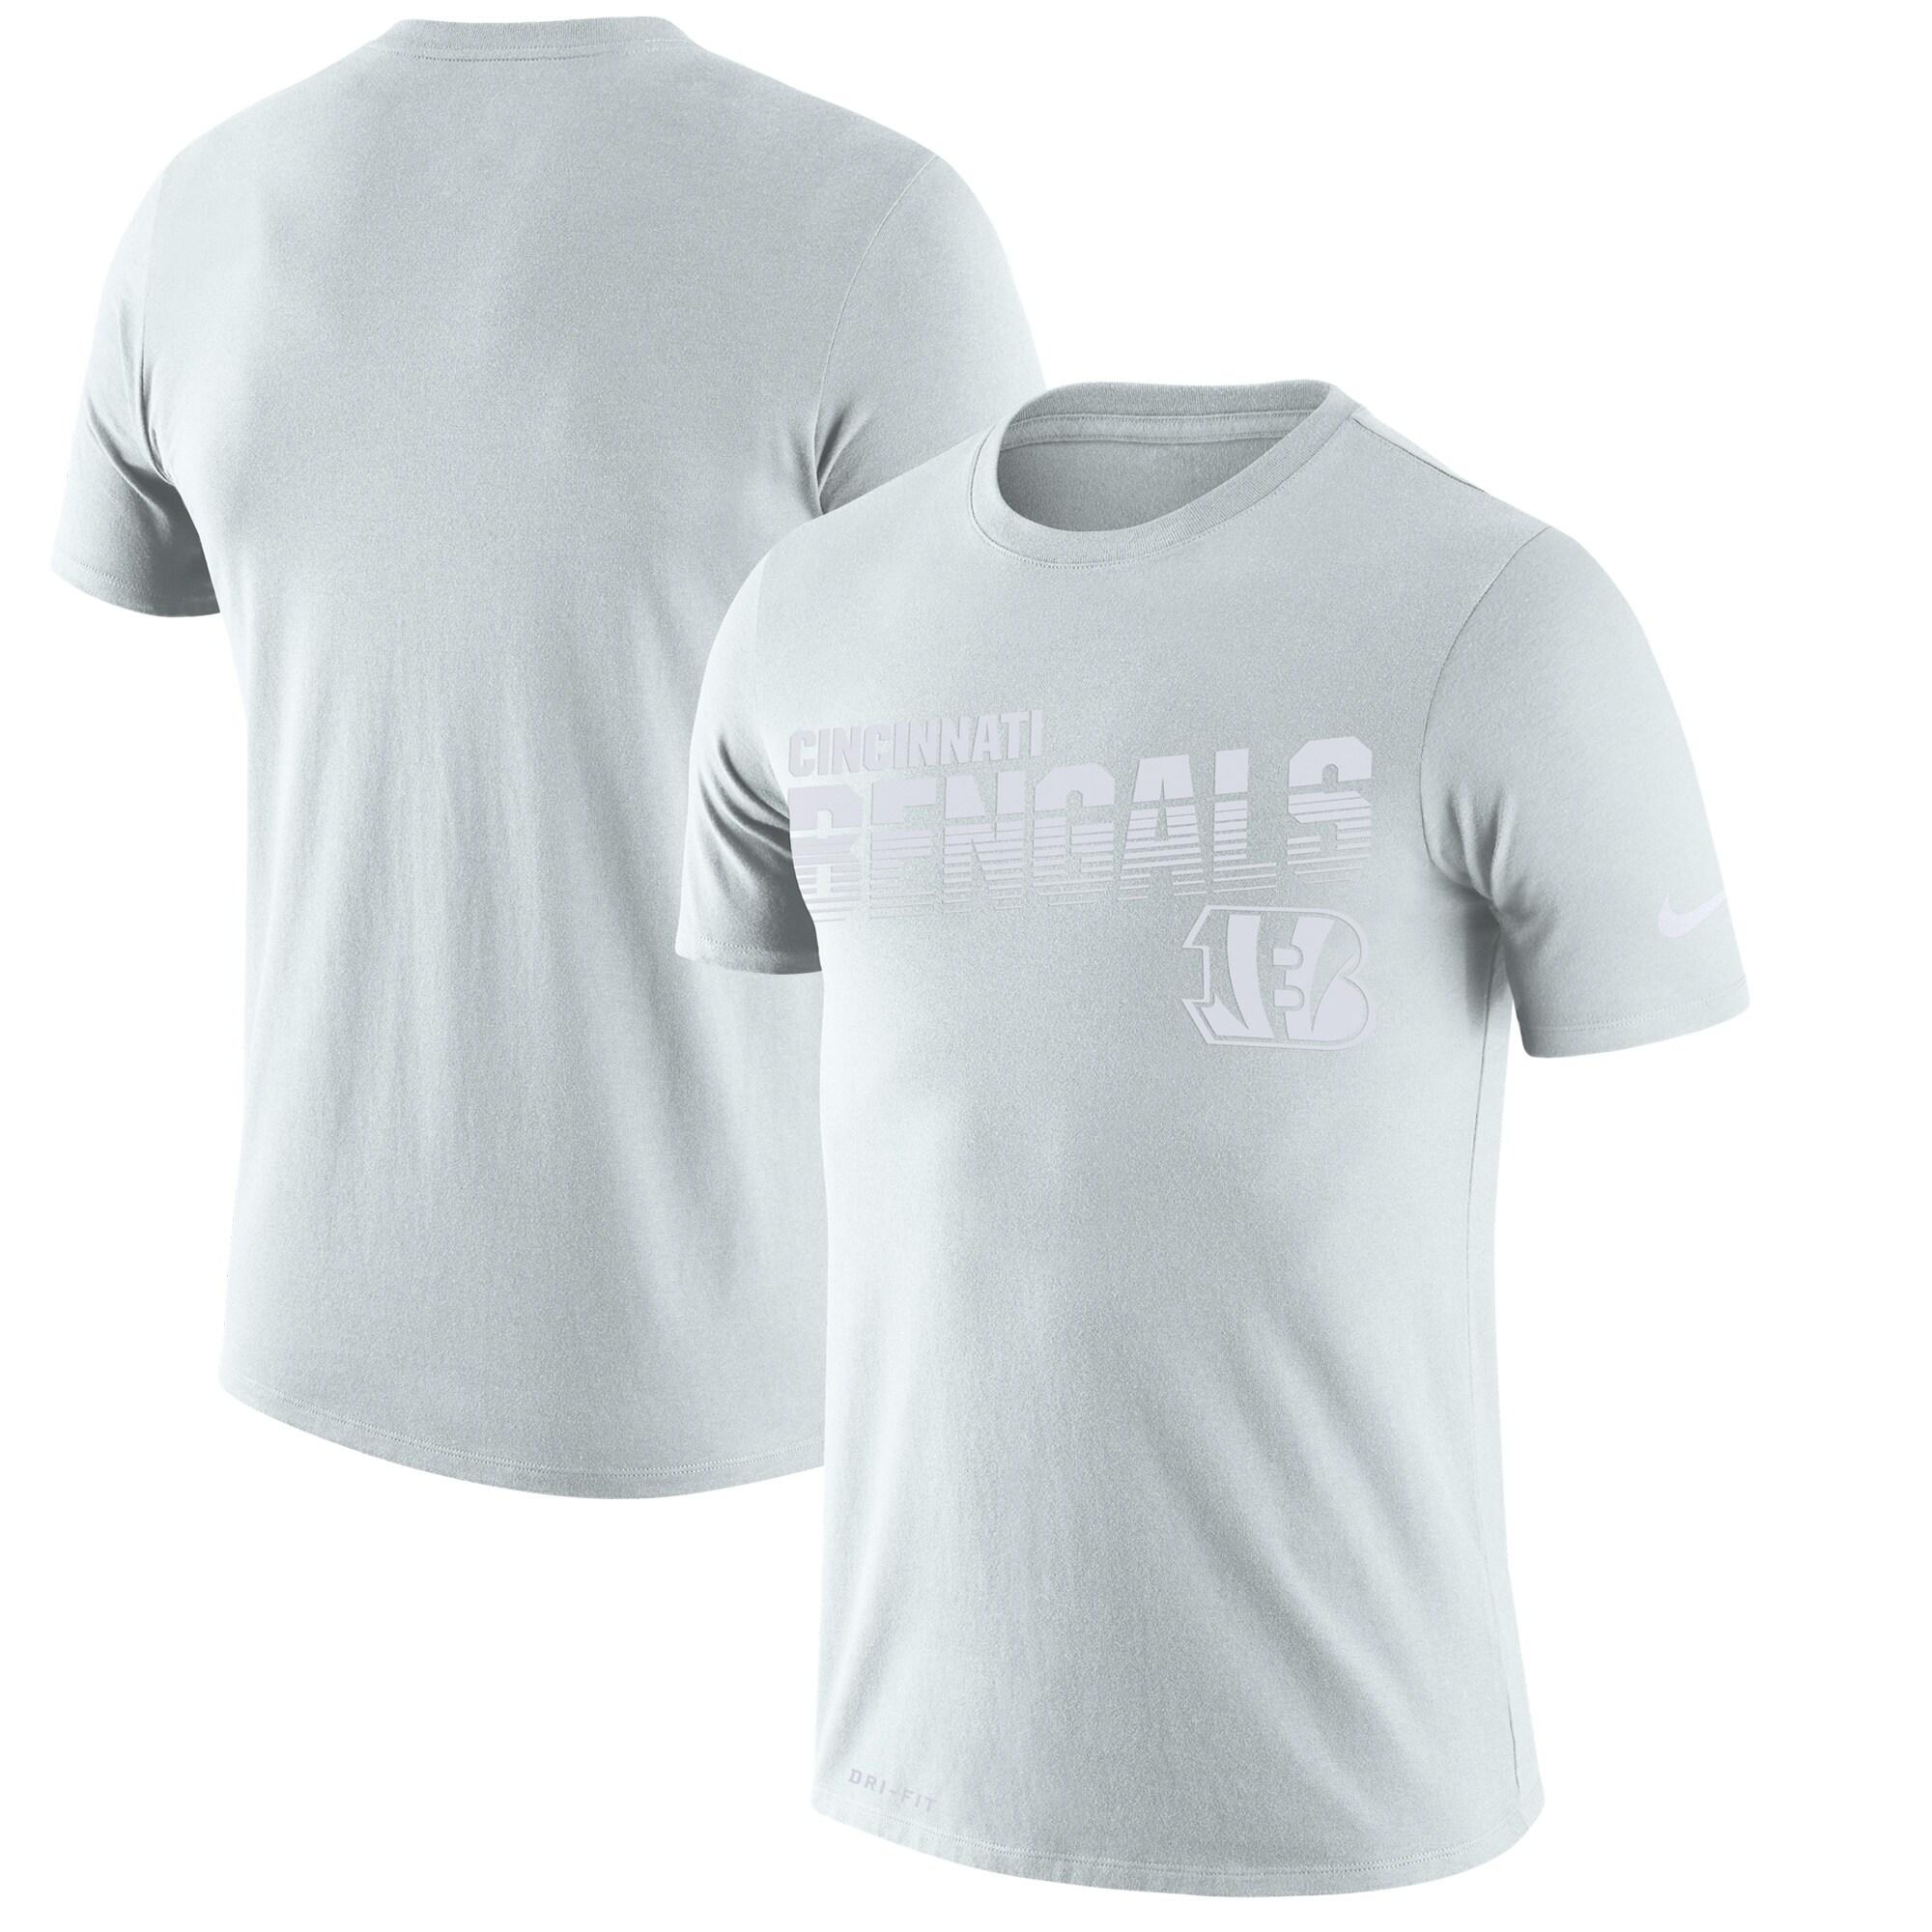 Cincinnati Bengals Nike Youth NFL 100 2019 Sideline Platinum Performance T-Shirt - White